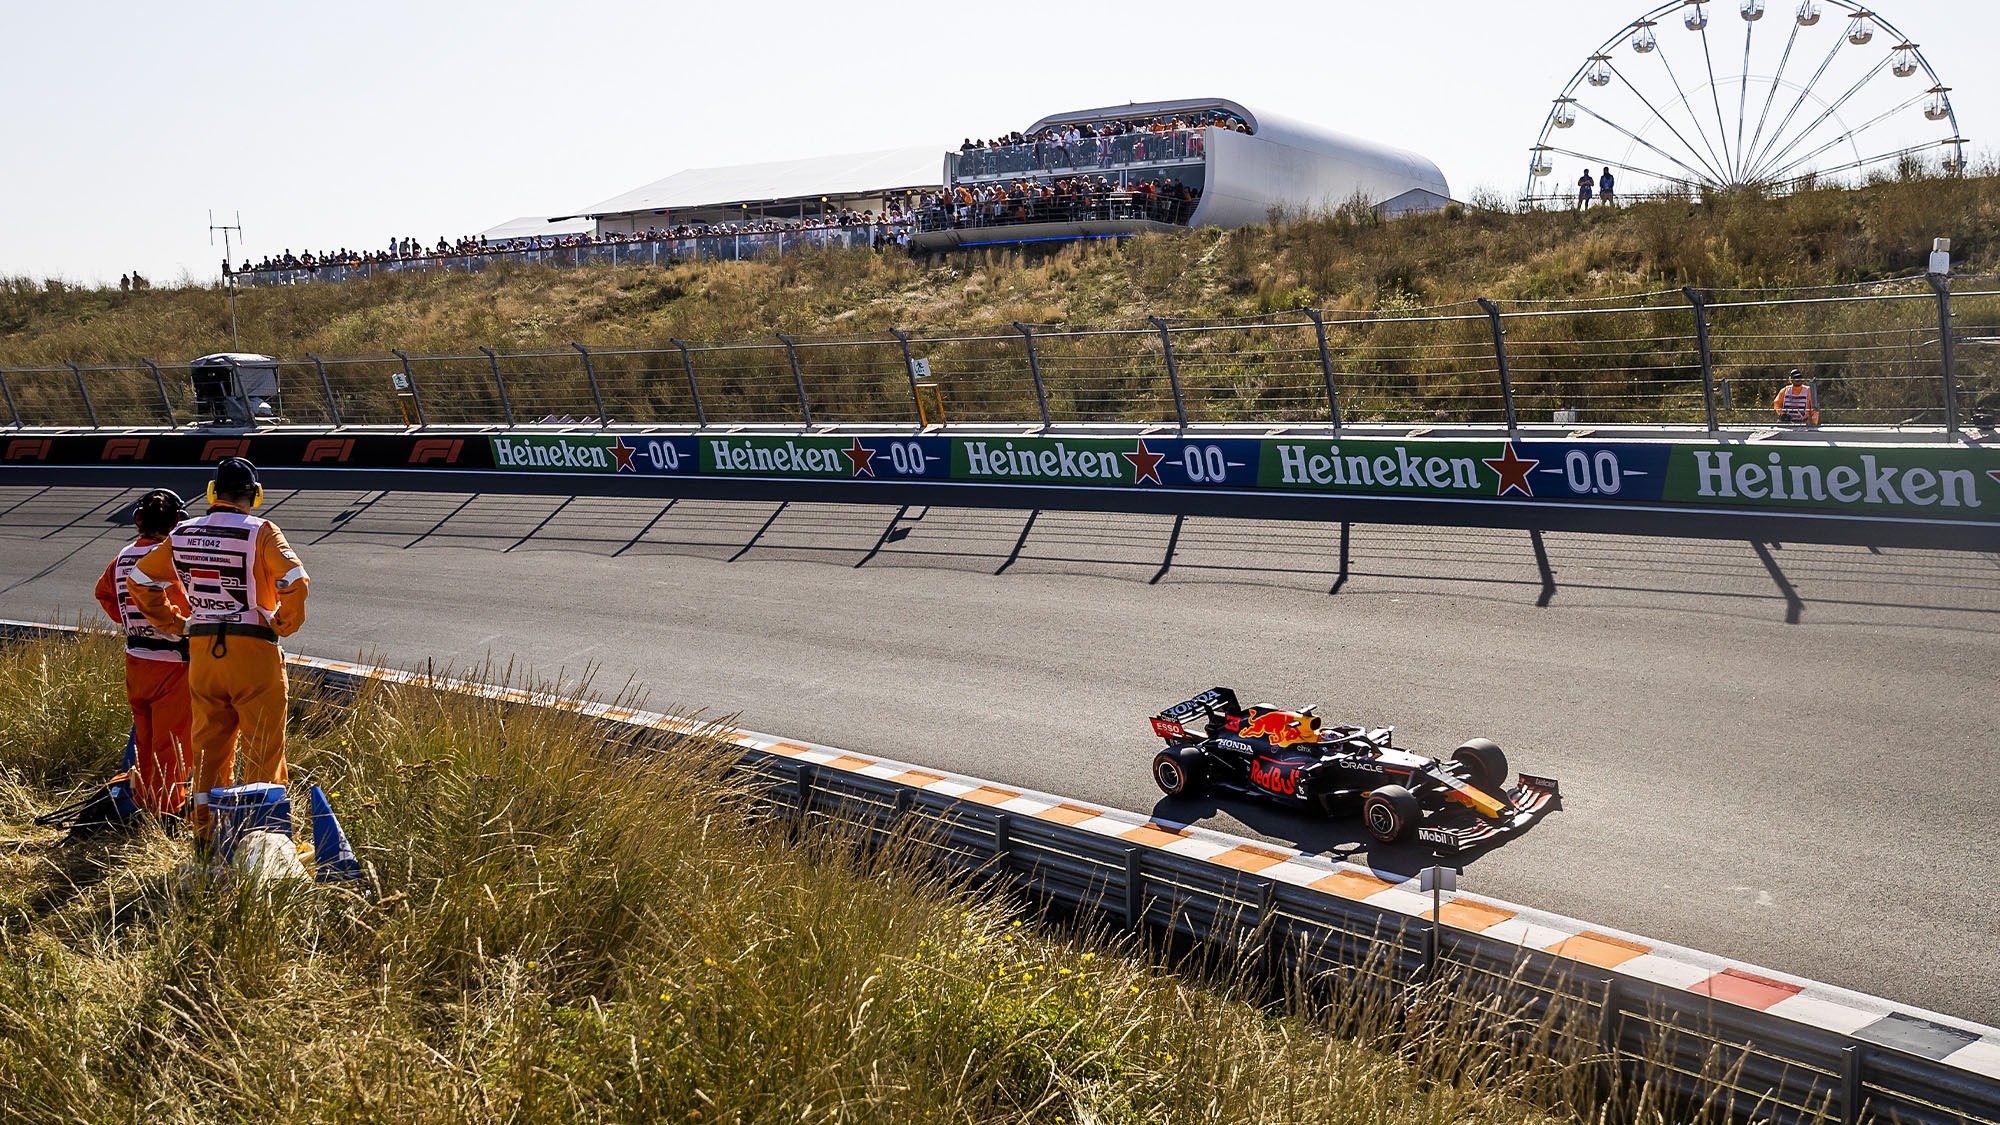 ZANDVOORT - Max Verstappen (Red Bull Racing) during the Dutch Grand Prix at the Zandvoort circuit. REMKO DE WAAL (Photo by ANP Sport via Getty Images)